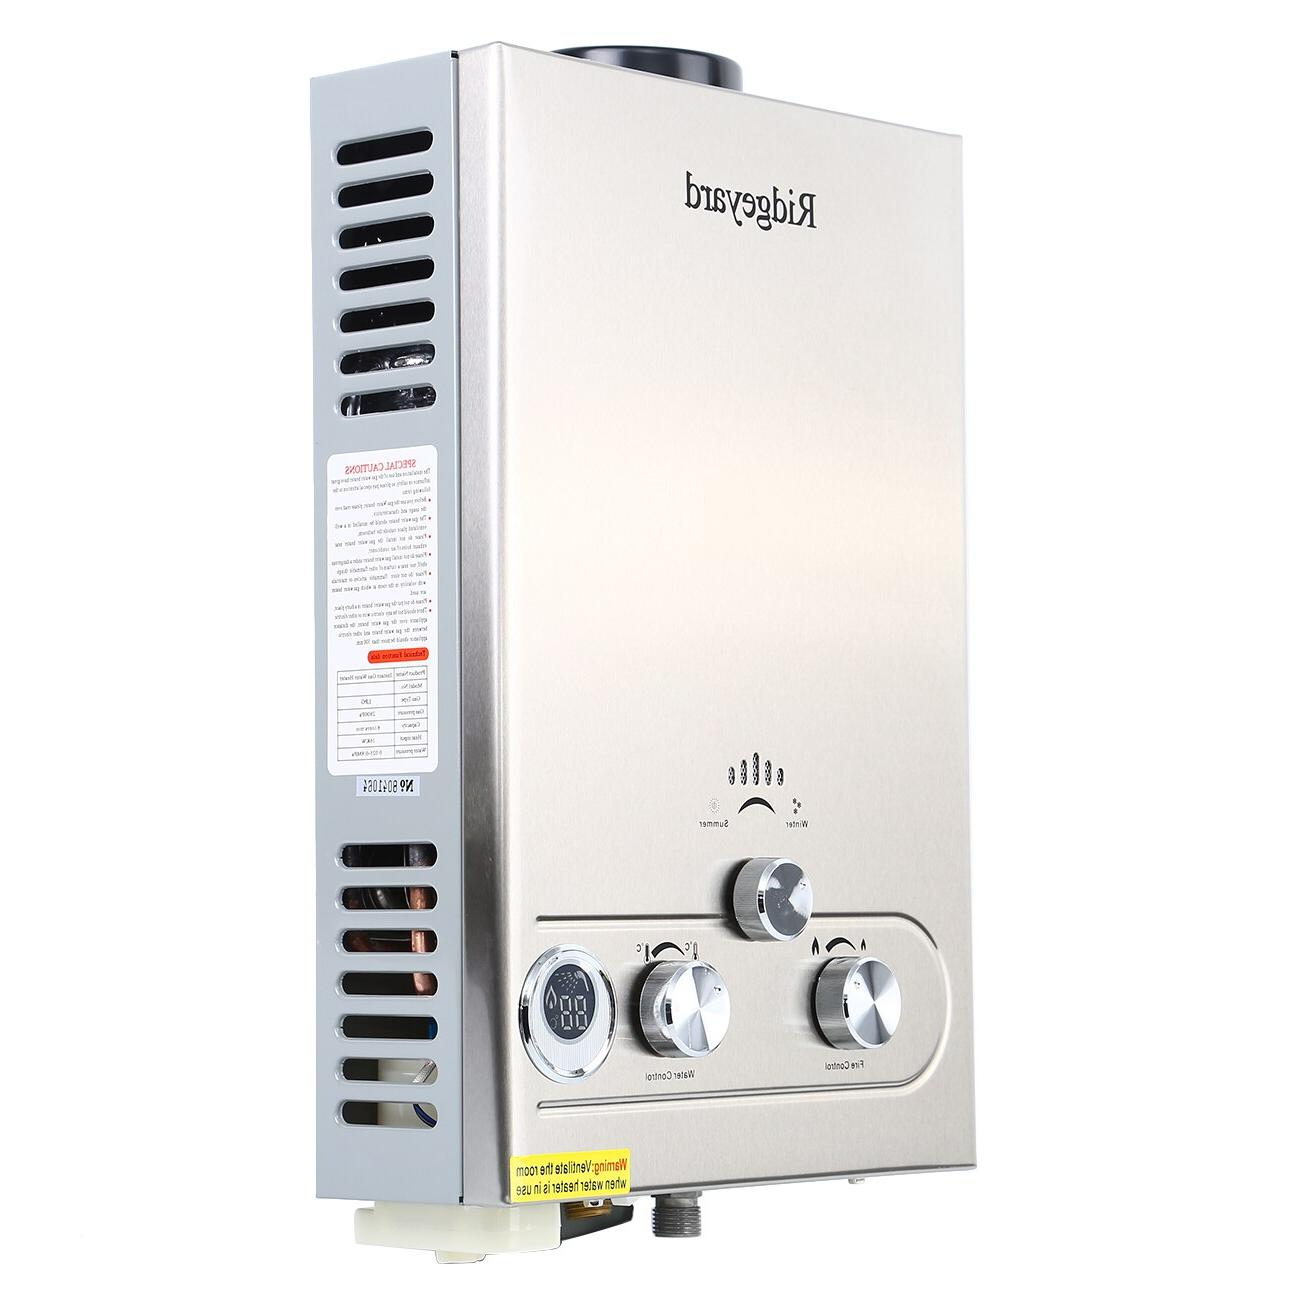 8L Boiler <font><b>Propane</b></font> <font><b>Gas</b></font> 2GPM Tankless <font><b>Heater</b></font> Stainless Steel